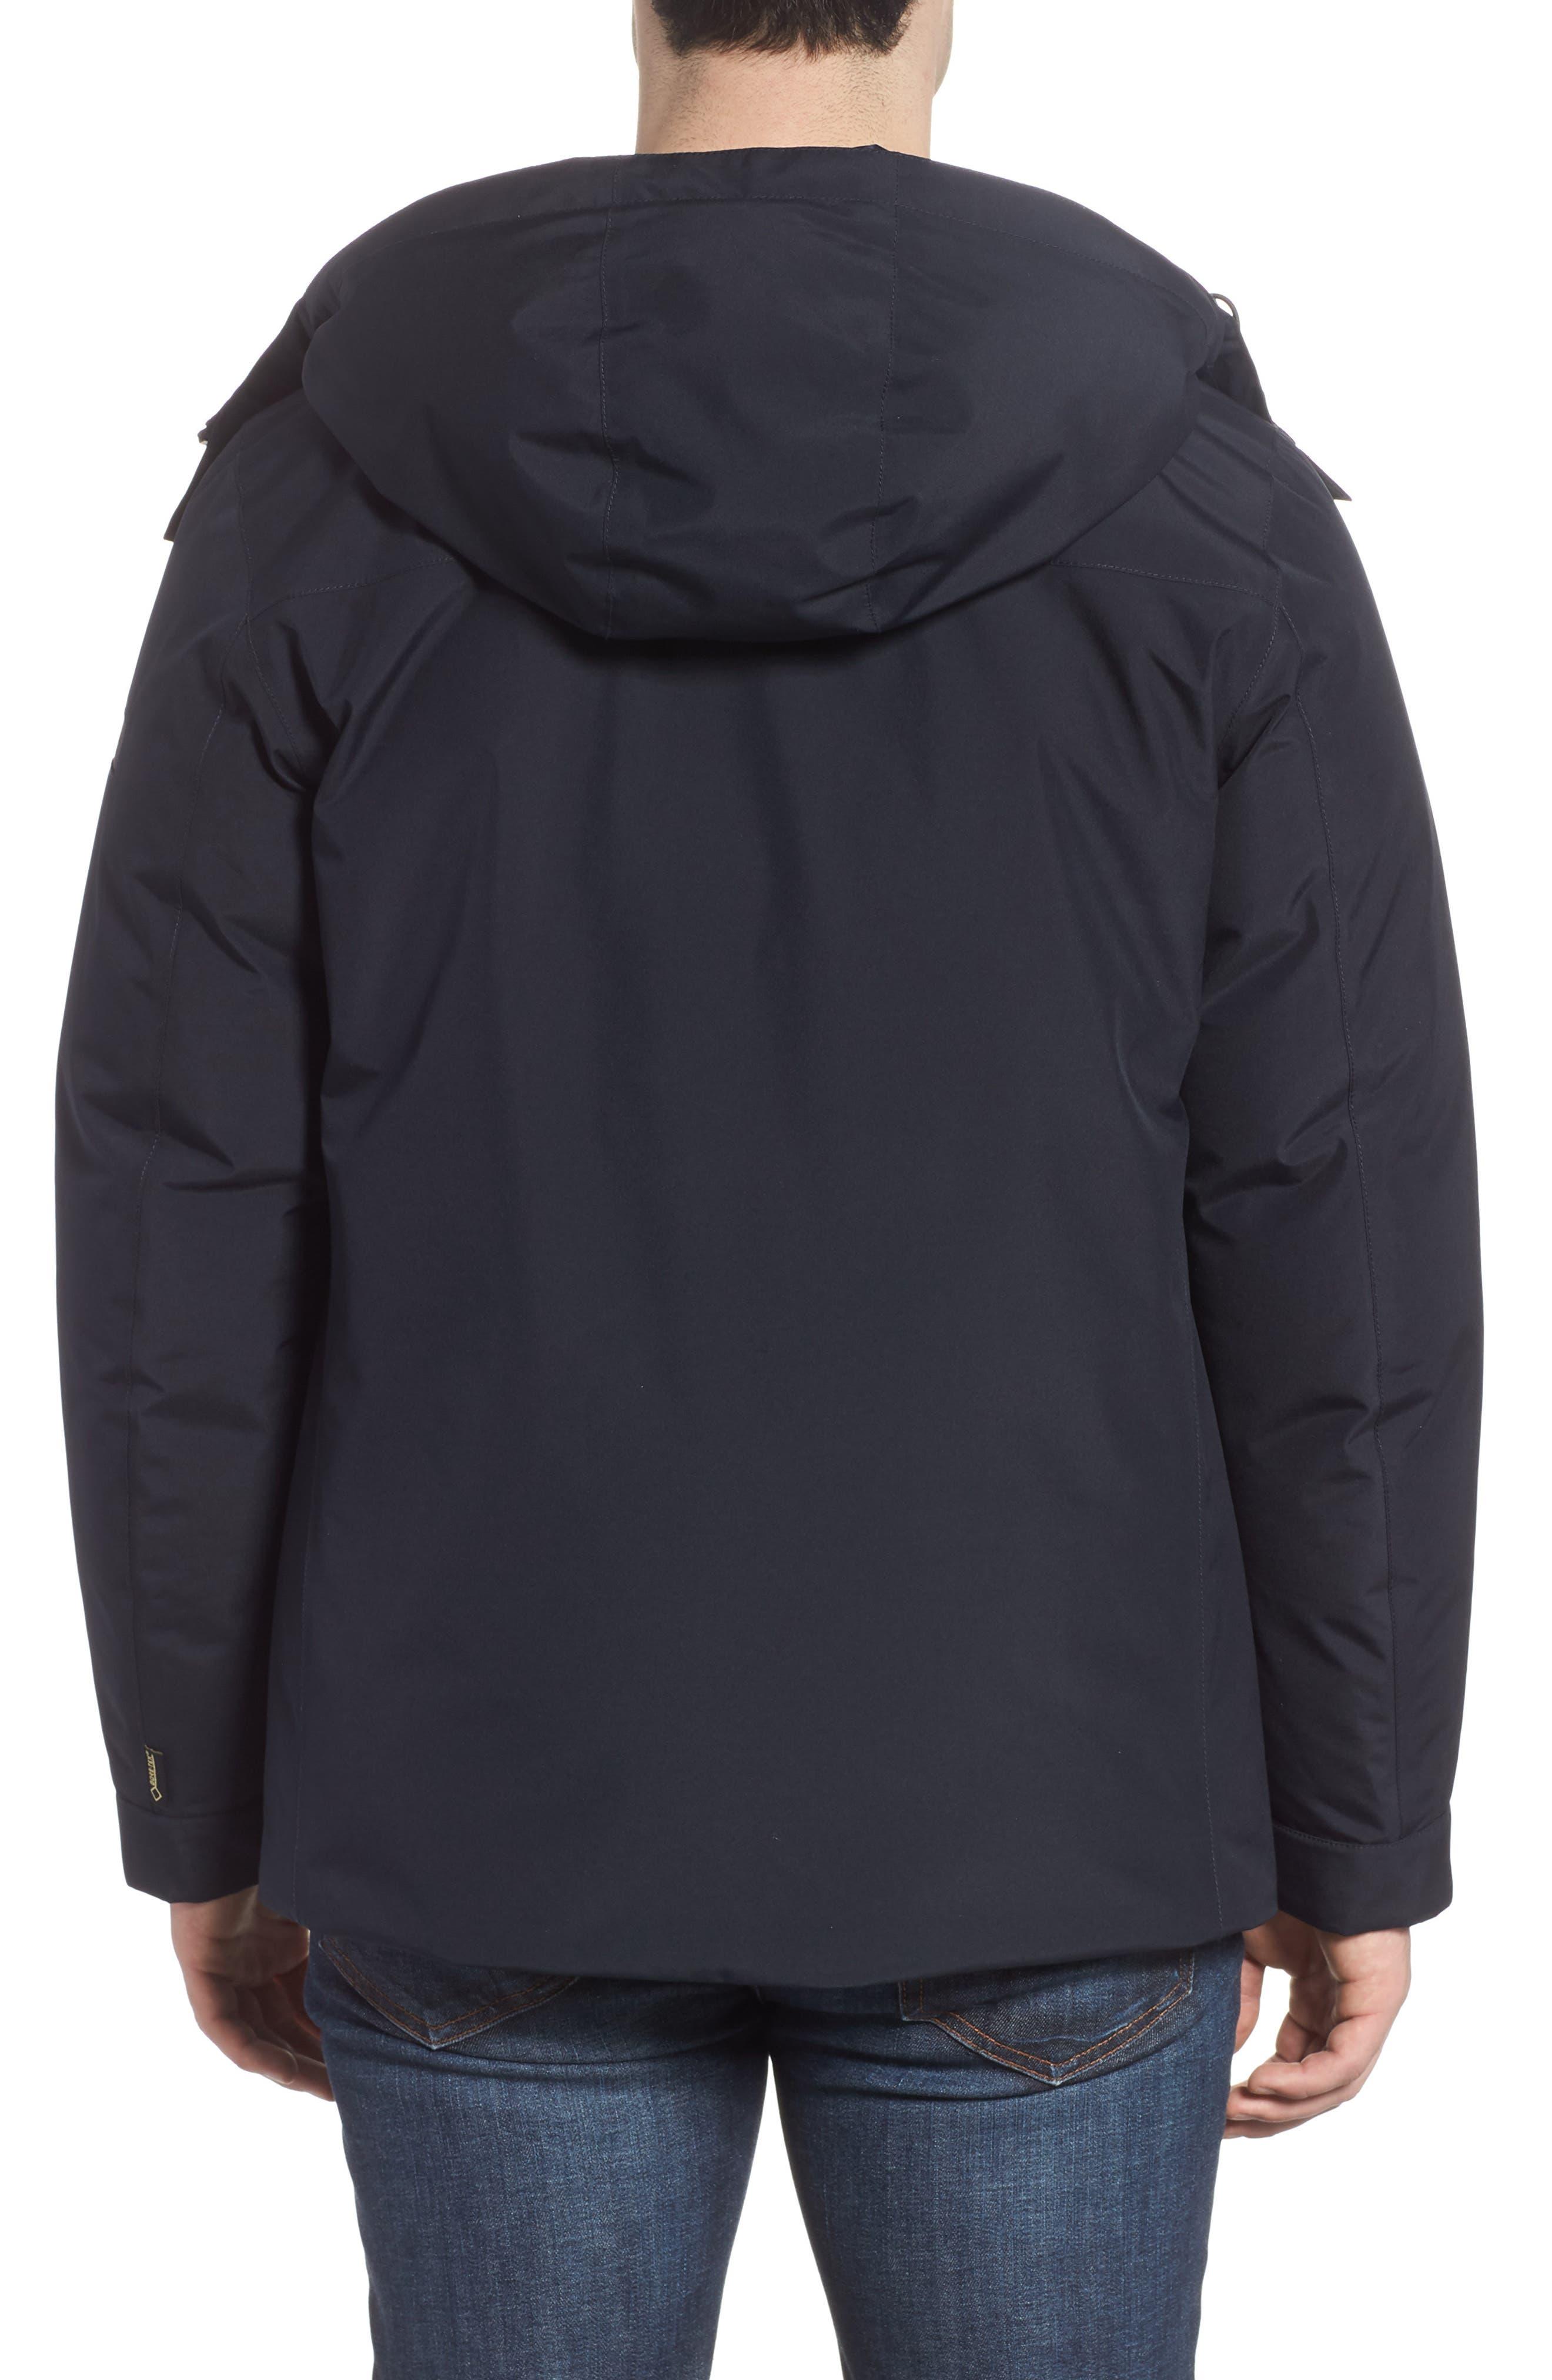 Waterproof Gore-Tex<sup>®</sup> Alpine Jacket,                             Alternate thumbnail 2, color,                             NAVY MELTON